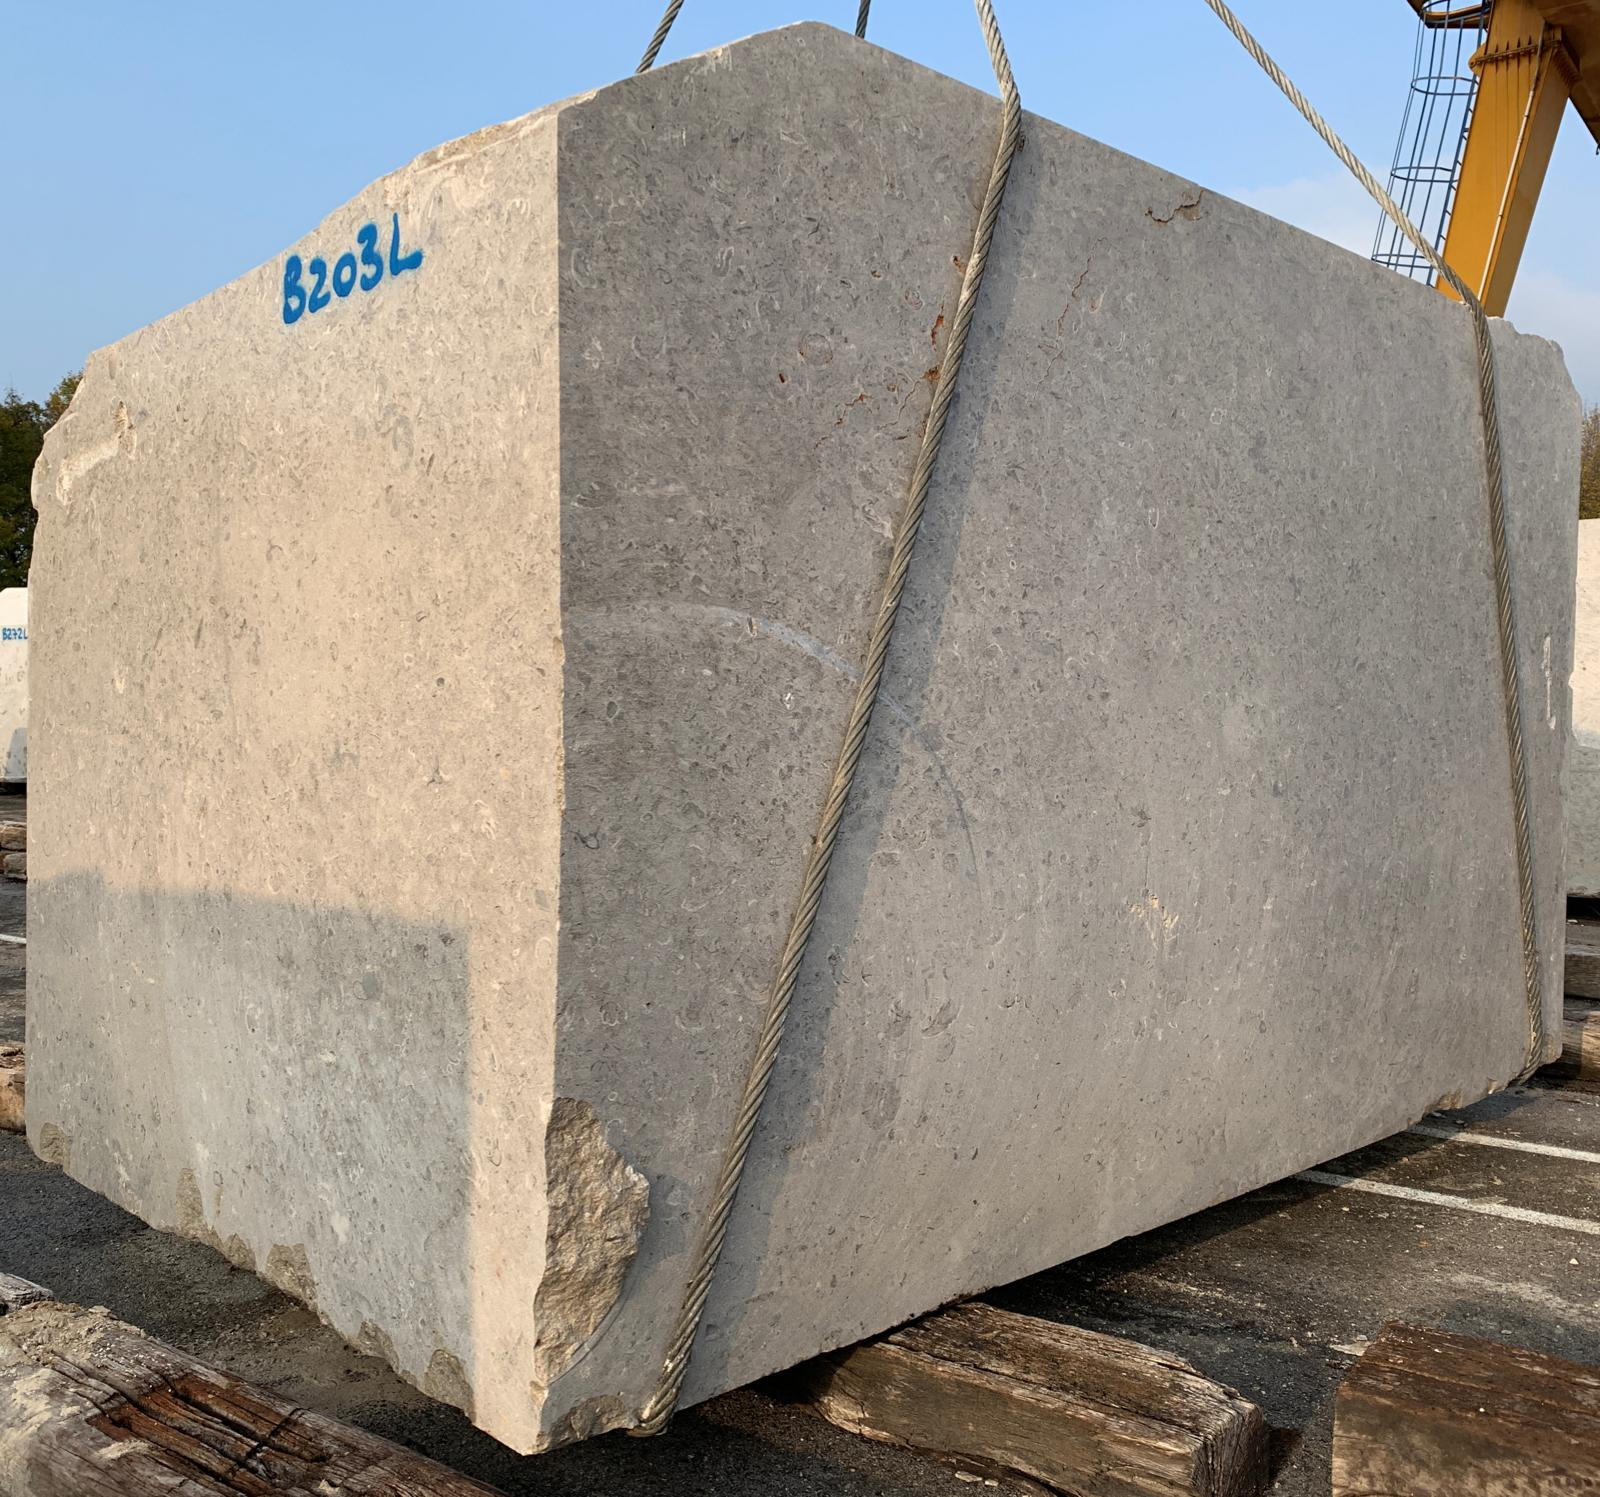 B203L - 300x175x175cm - 24.34tn (1)